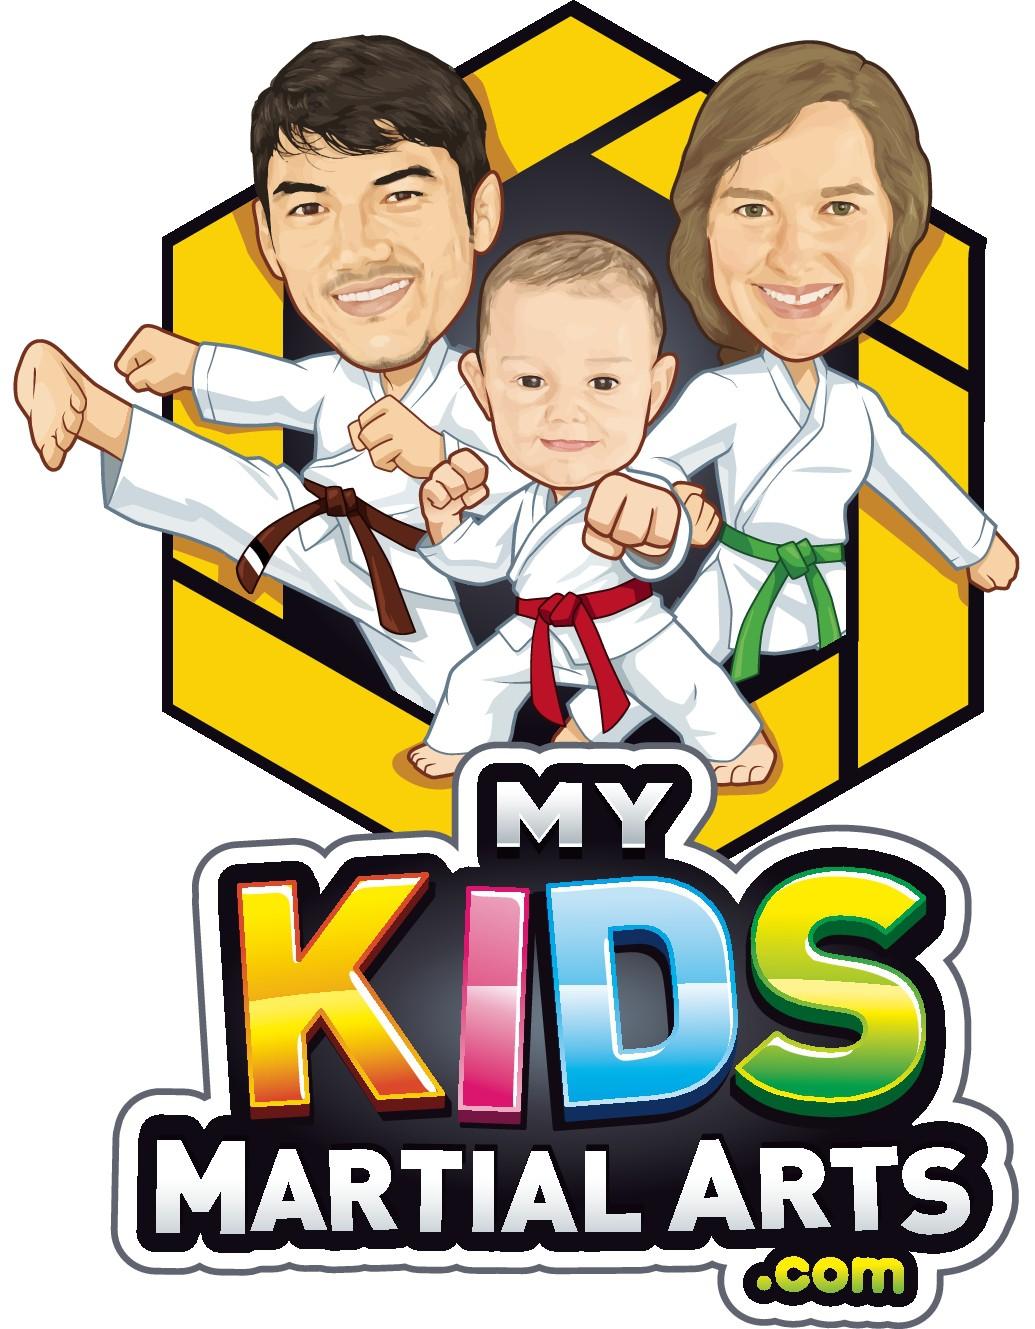 EYE-CATCHING logo for MyKidsMartialArts.COM!!